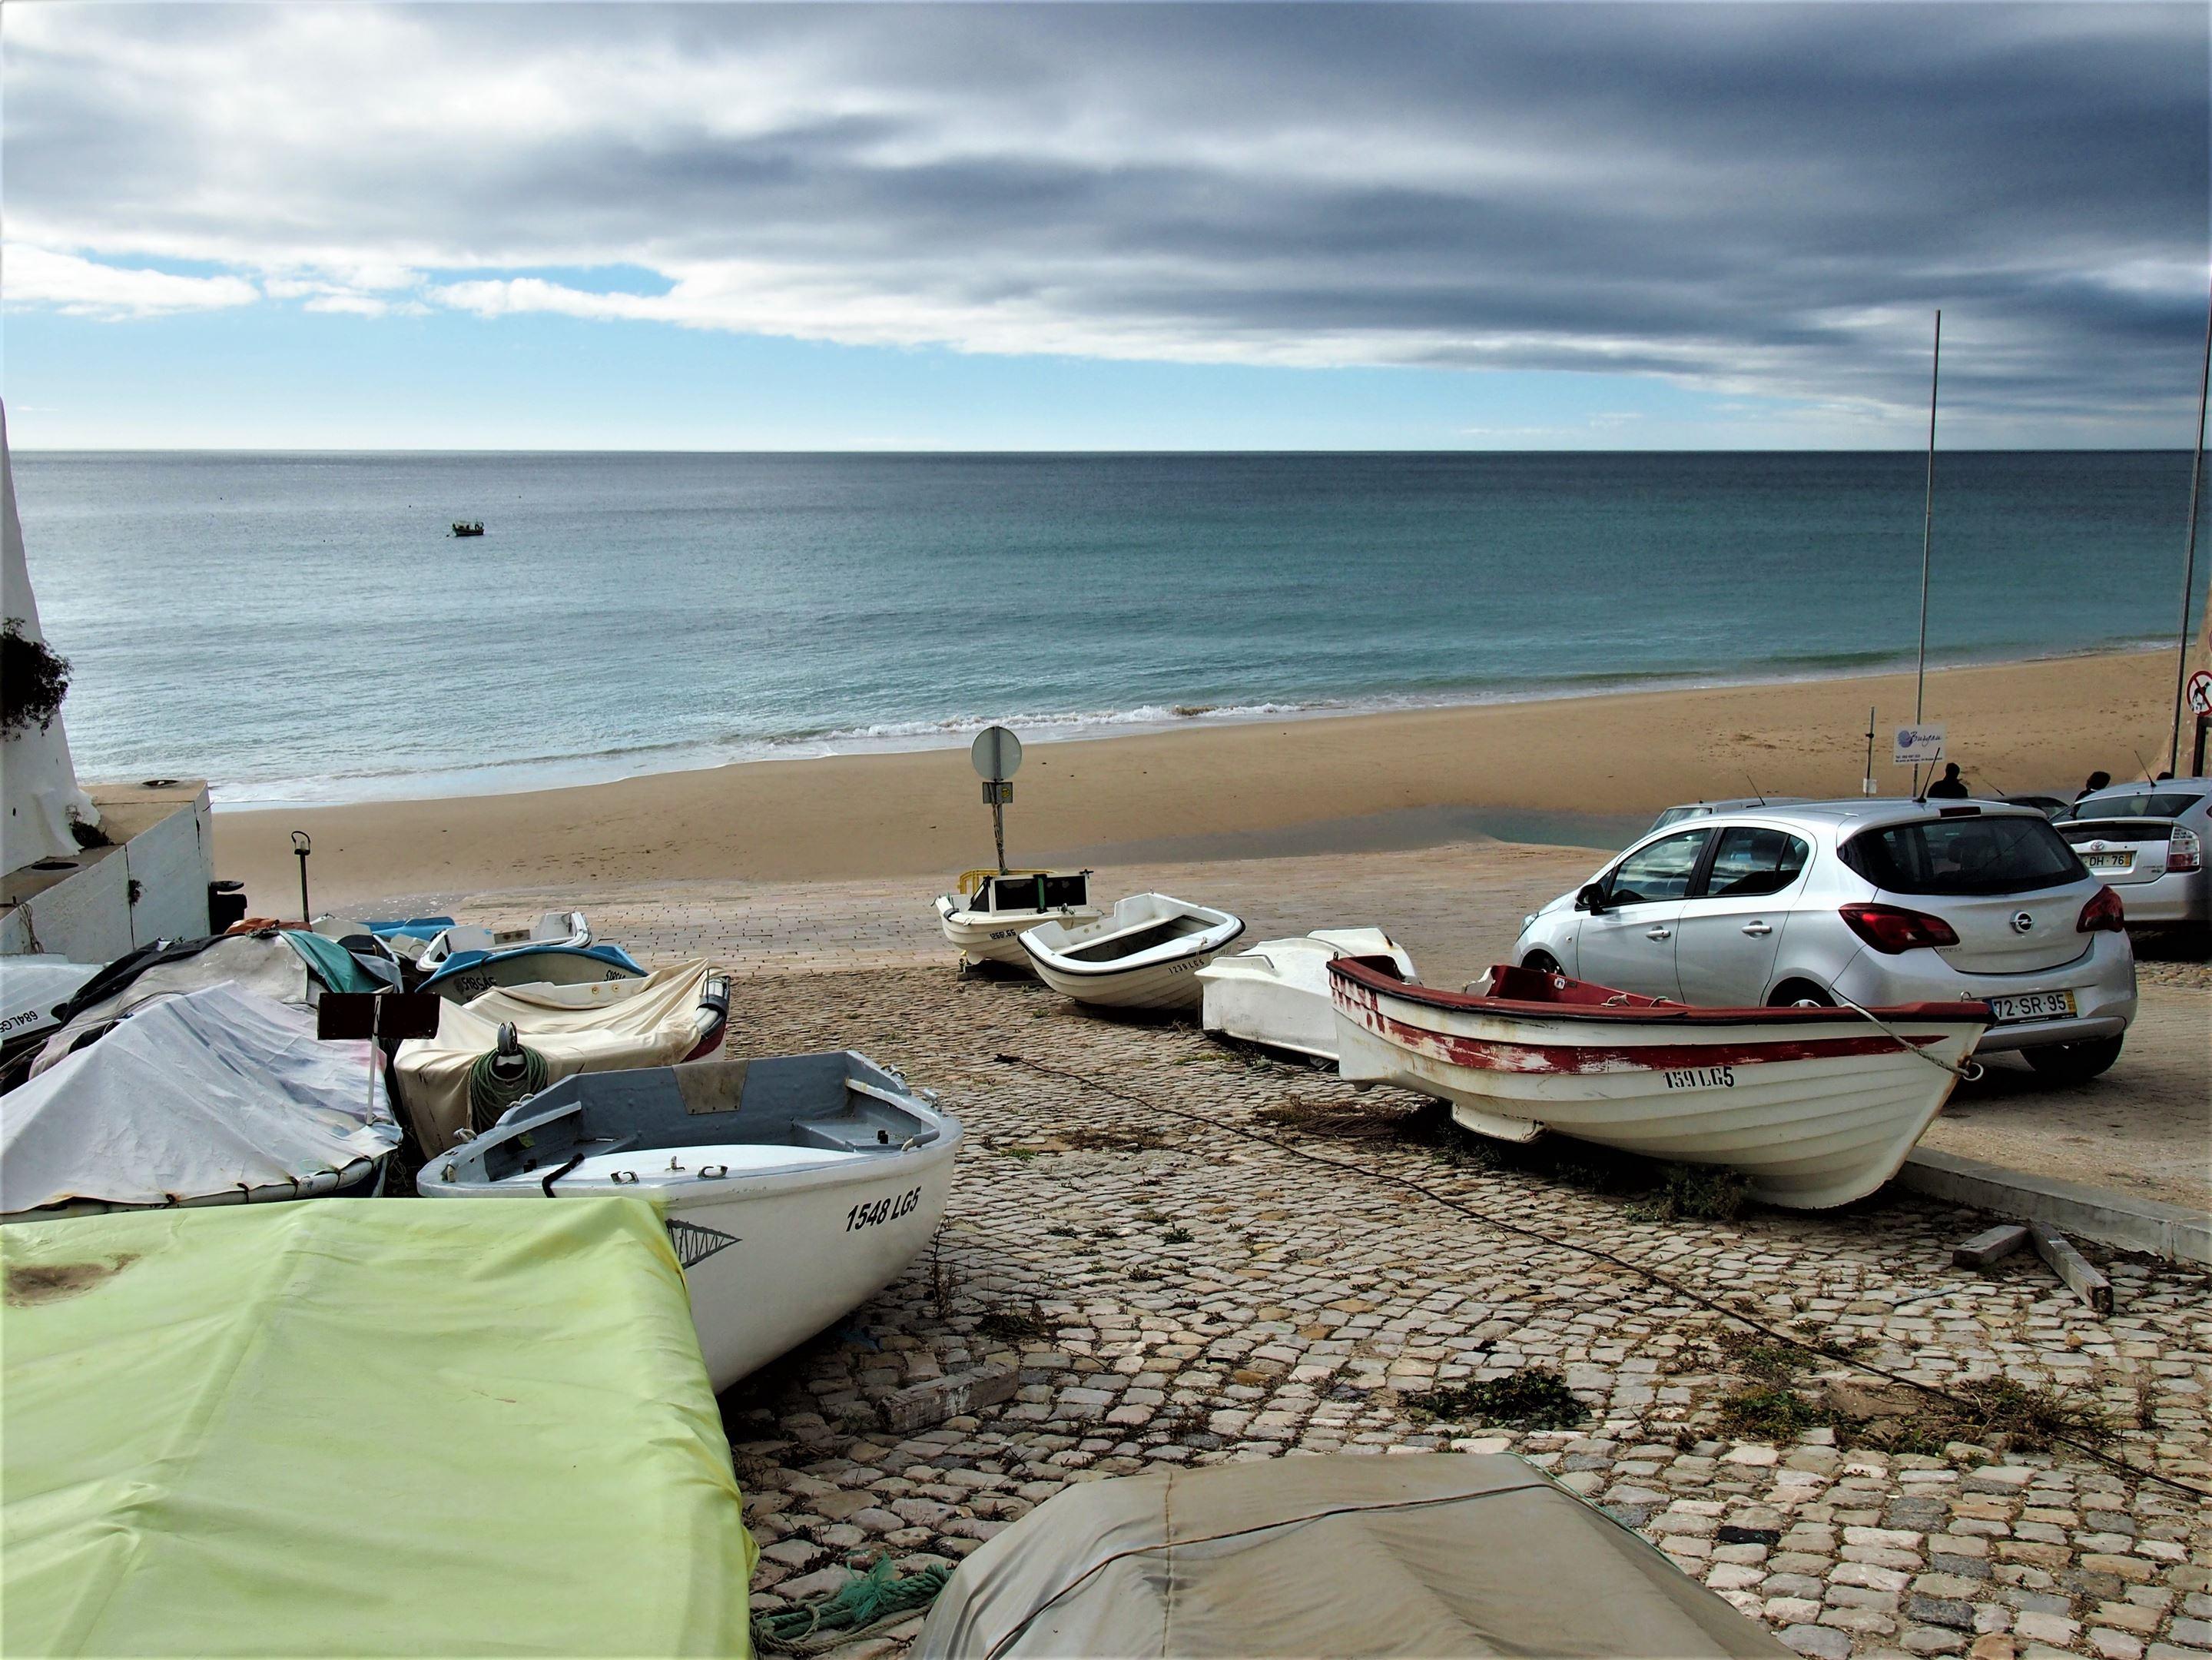 Small fishing boats at Praia de Burgau, Algarve